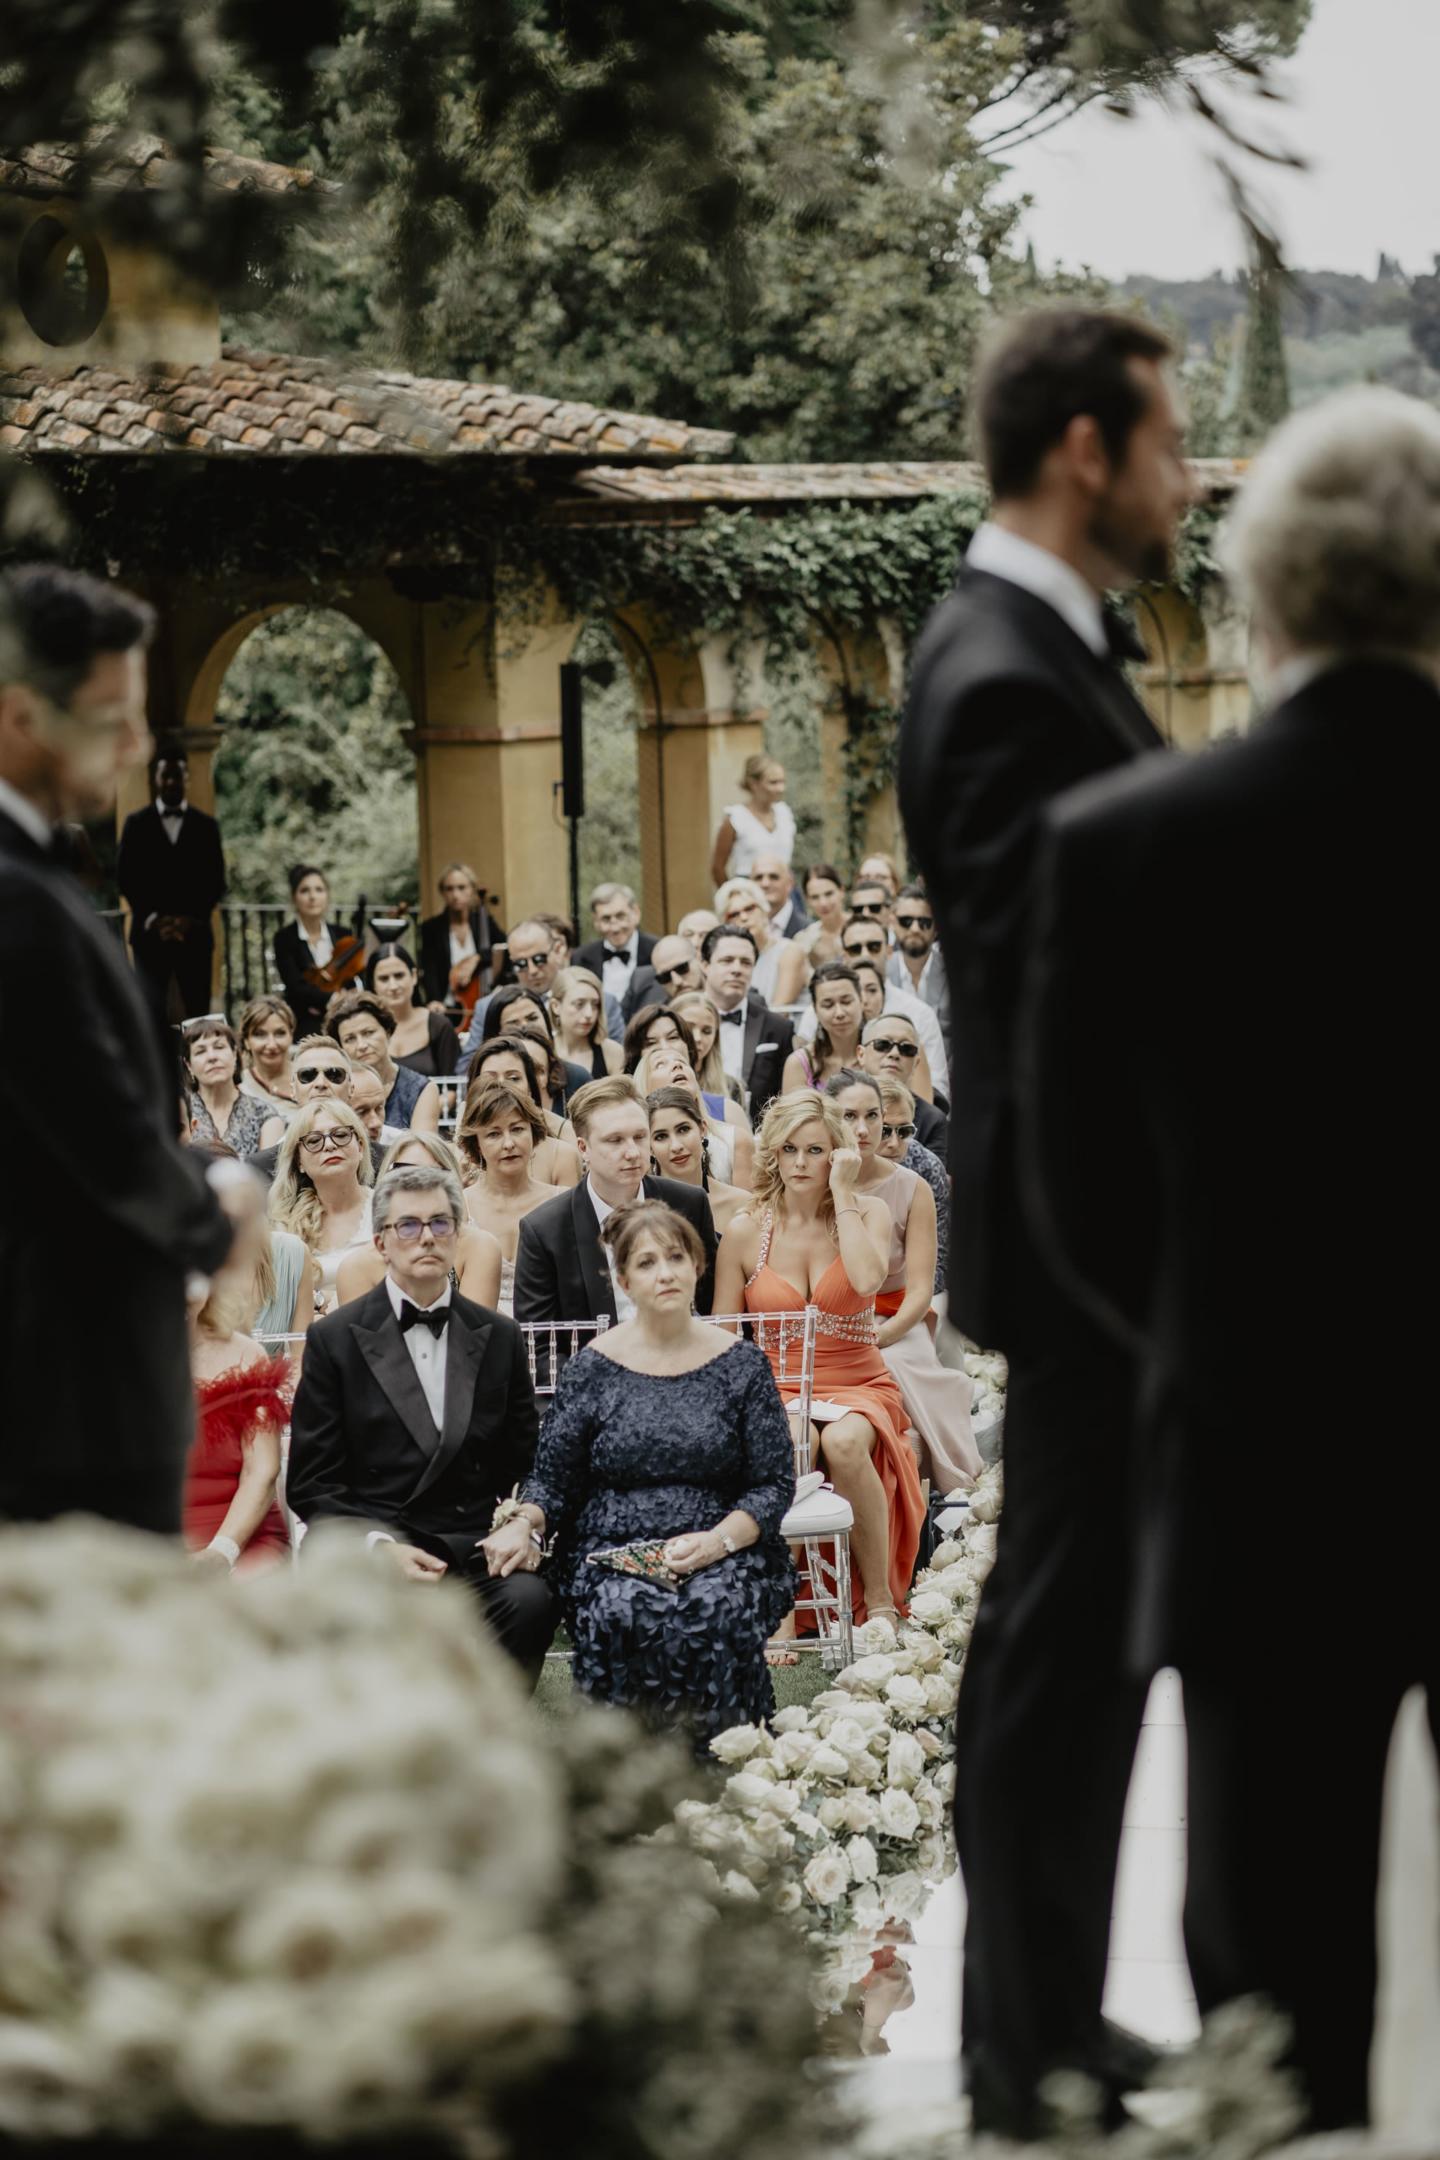 A sparkling wedding in the shore of the Arno - 41 :: A sparkling wedding on the shore of the Arno :: Luxury wedding photography - 40 :: A sparkling wedding in the shore of the Arno - 41